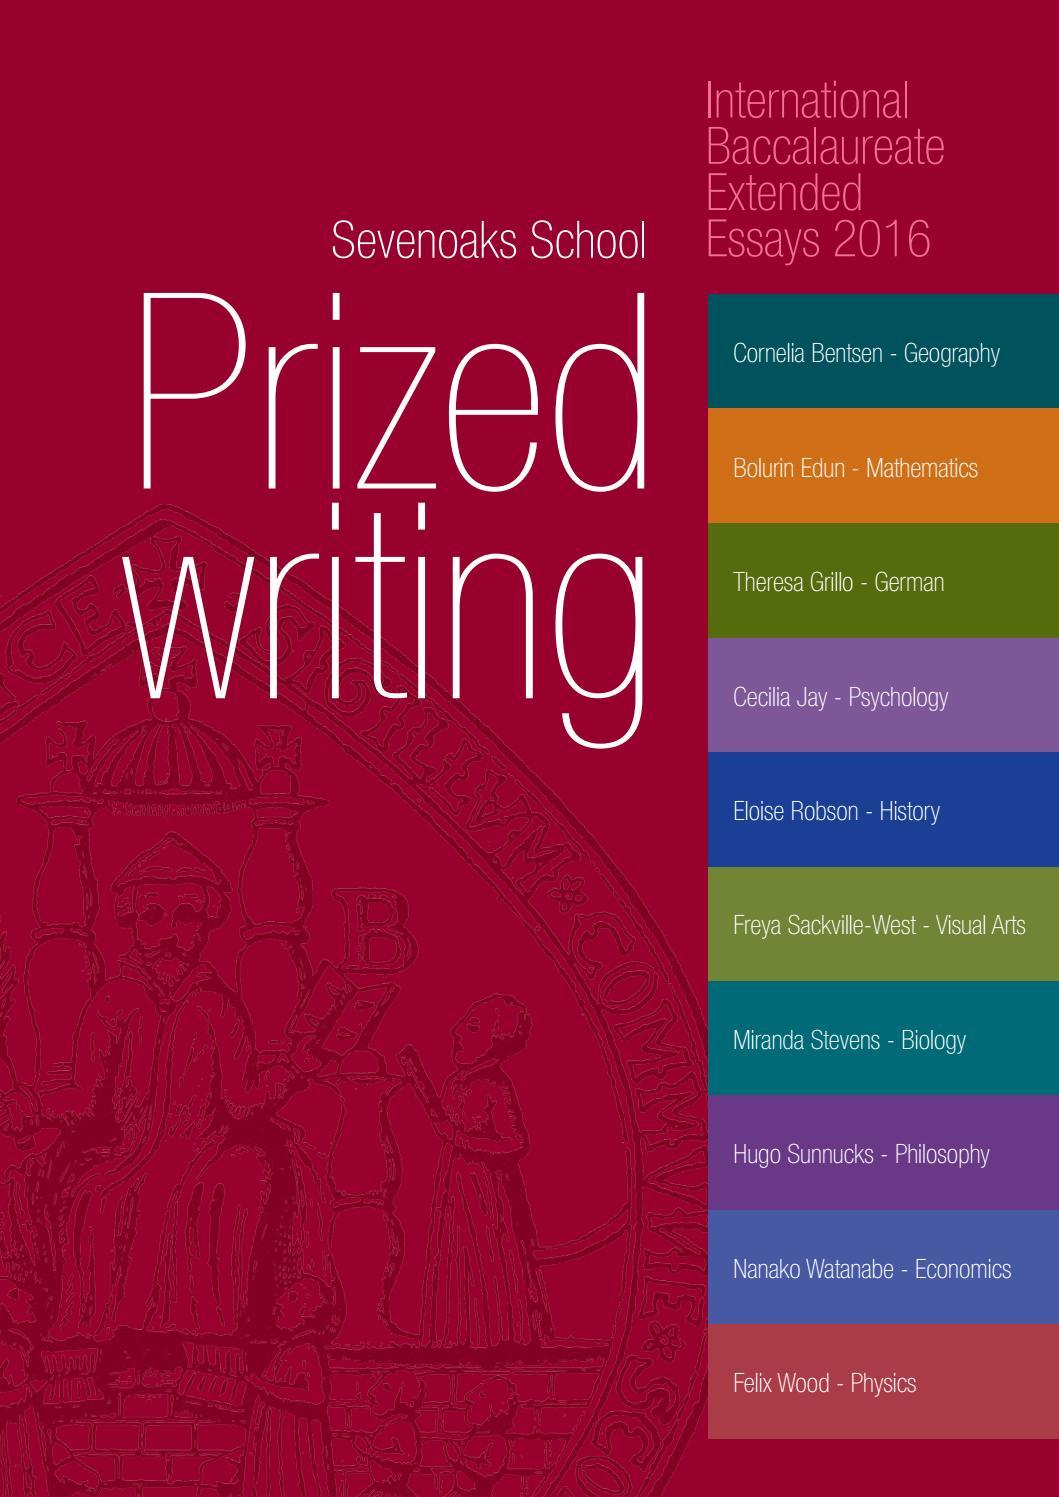 Sevenoaks School - IB prized writing 2016 by sevenoaks